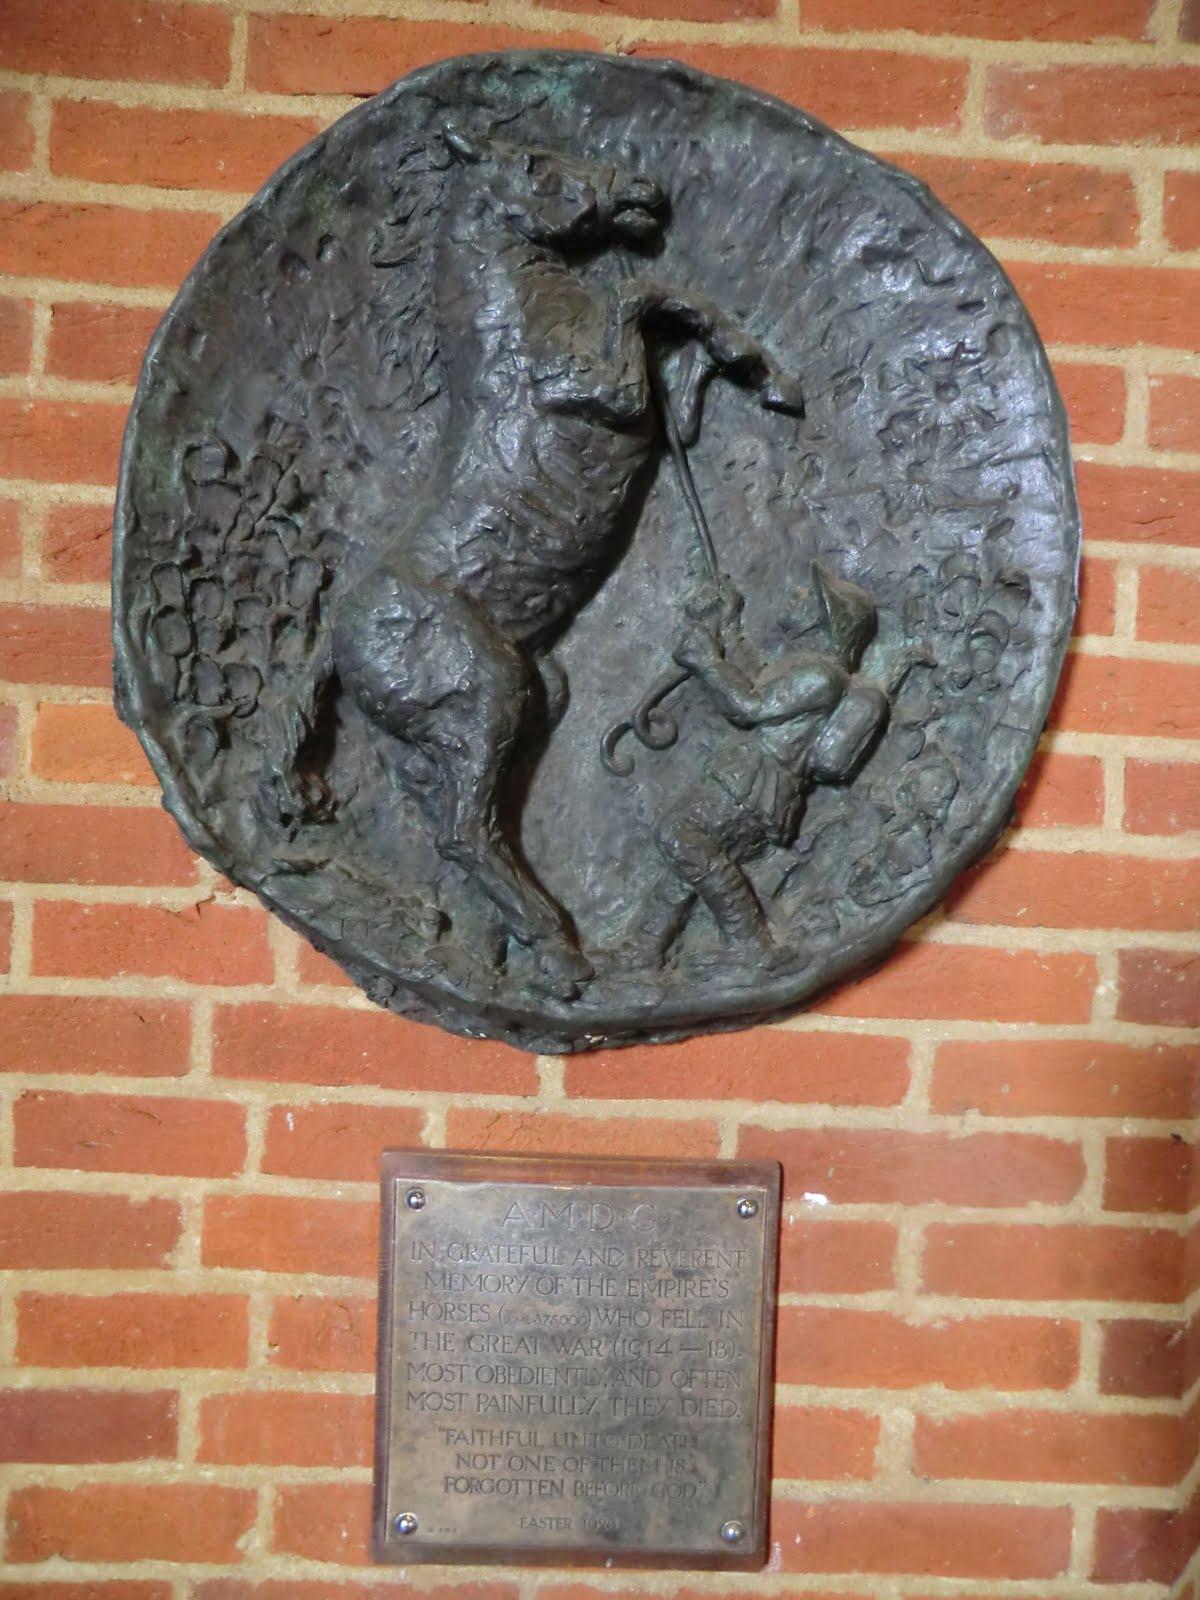 CIMG0610 WWI memorial, St Jude's church